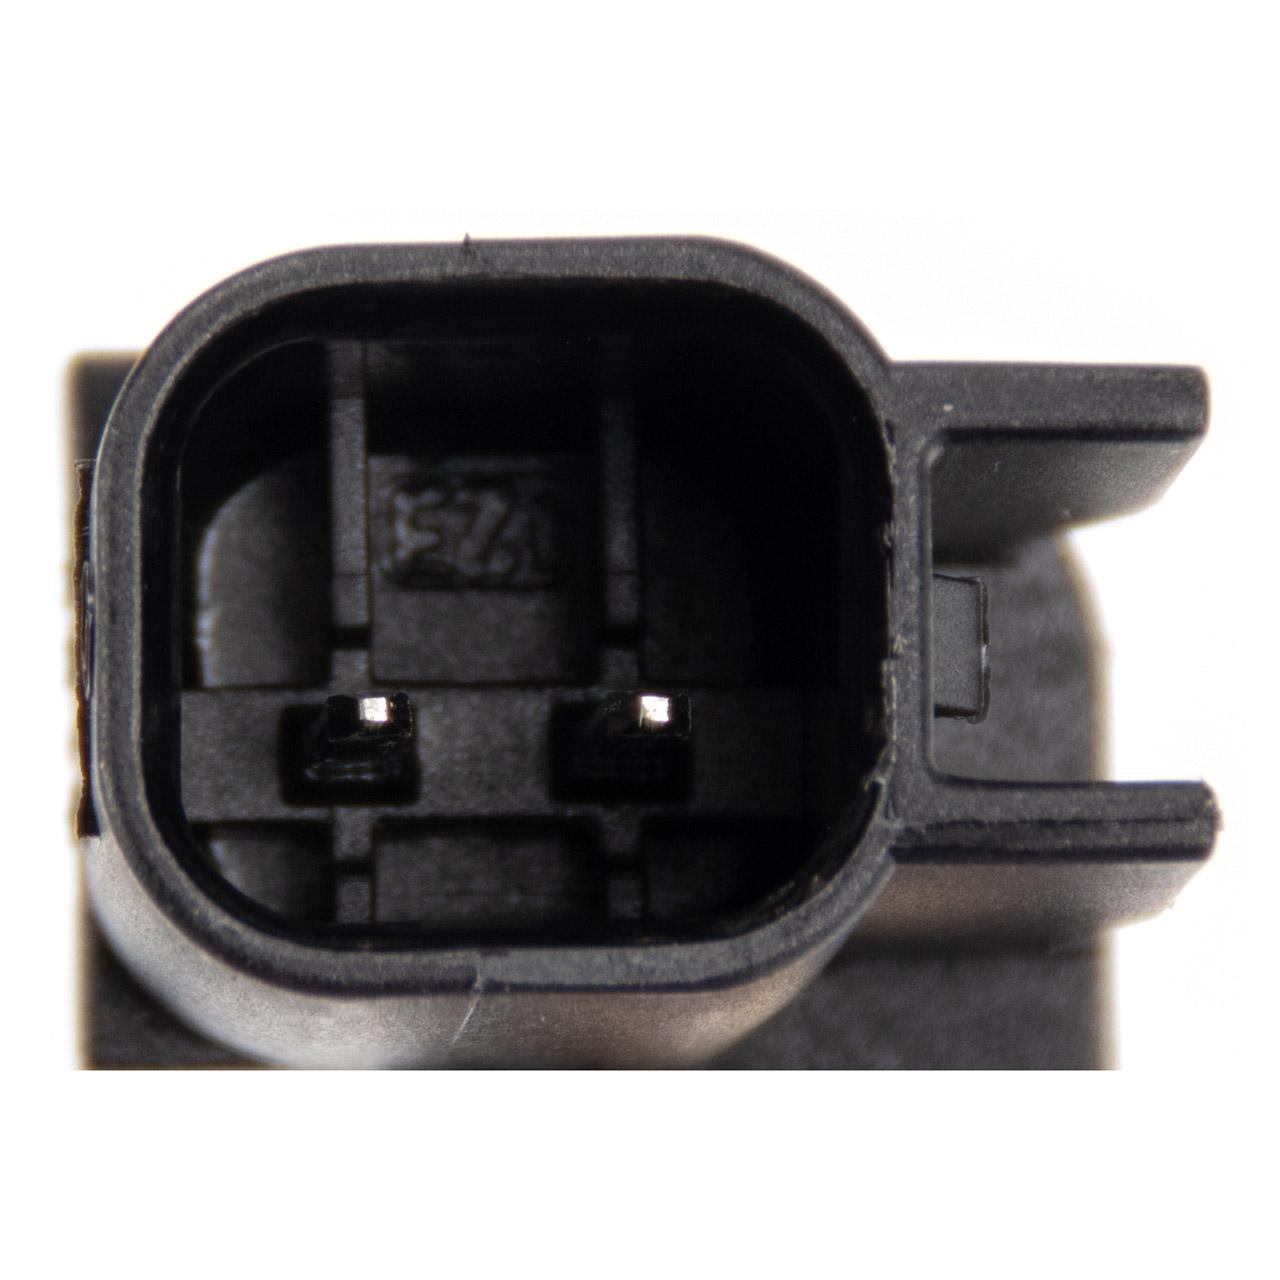 ORIGINAL Ford ABS Sensor Raddrehzahlsensor C-MAX 2 FOCUS 3 KUGA 2 hinten 1847905